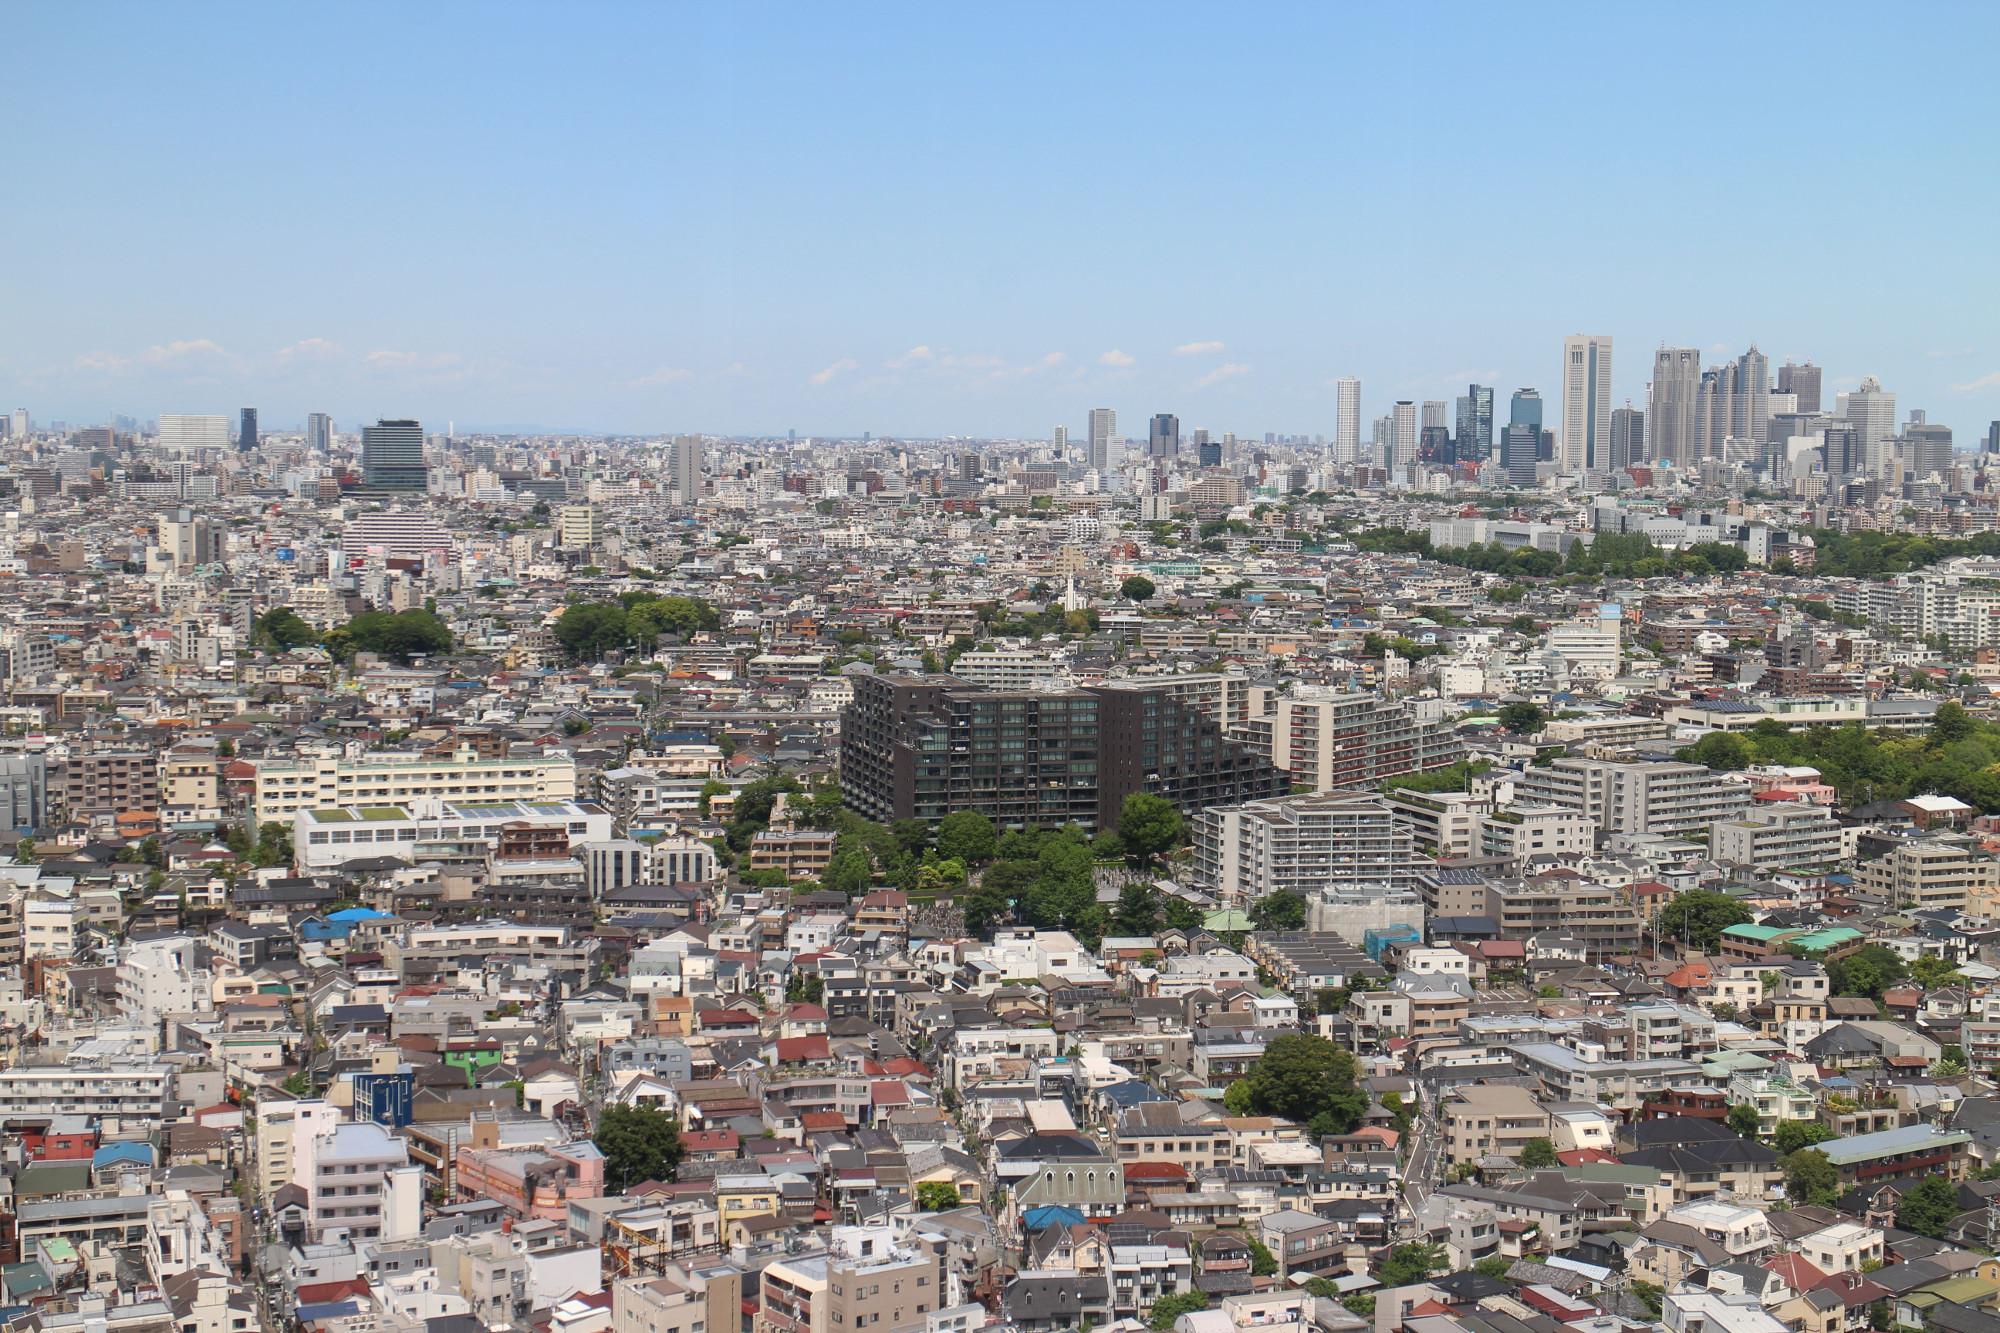 Der Ausblick vom Carrot Tower: rechts die Türme von Shinjuku, links Shimokitazawa.